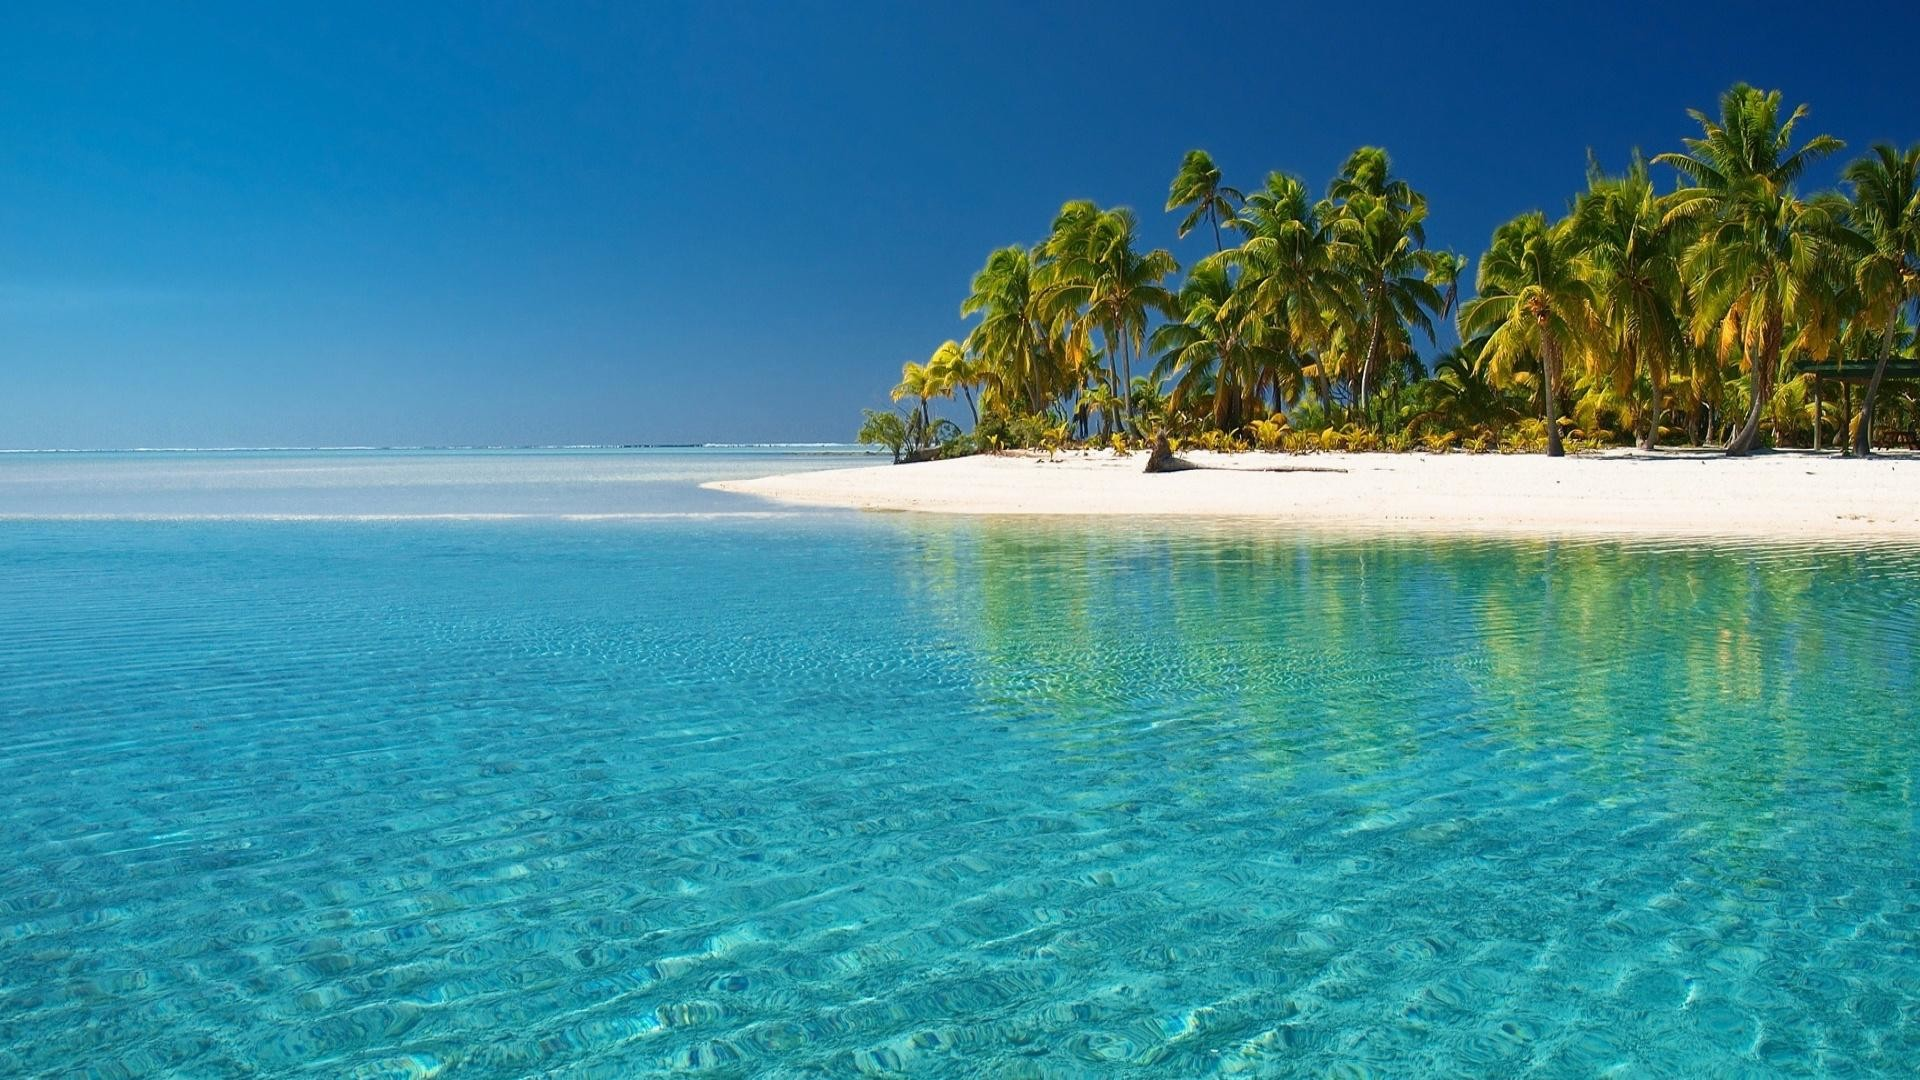 Filename: beach-desktop-wallpapers1.jpg